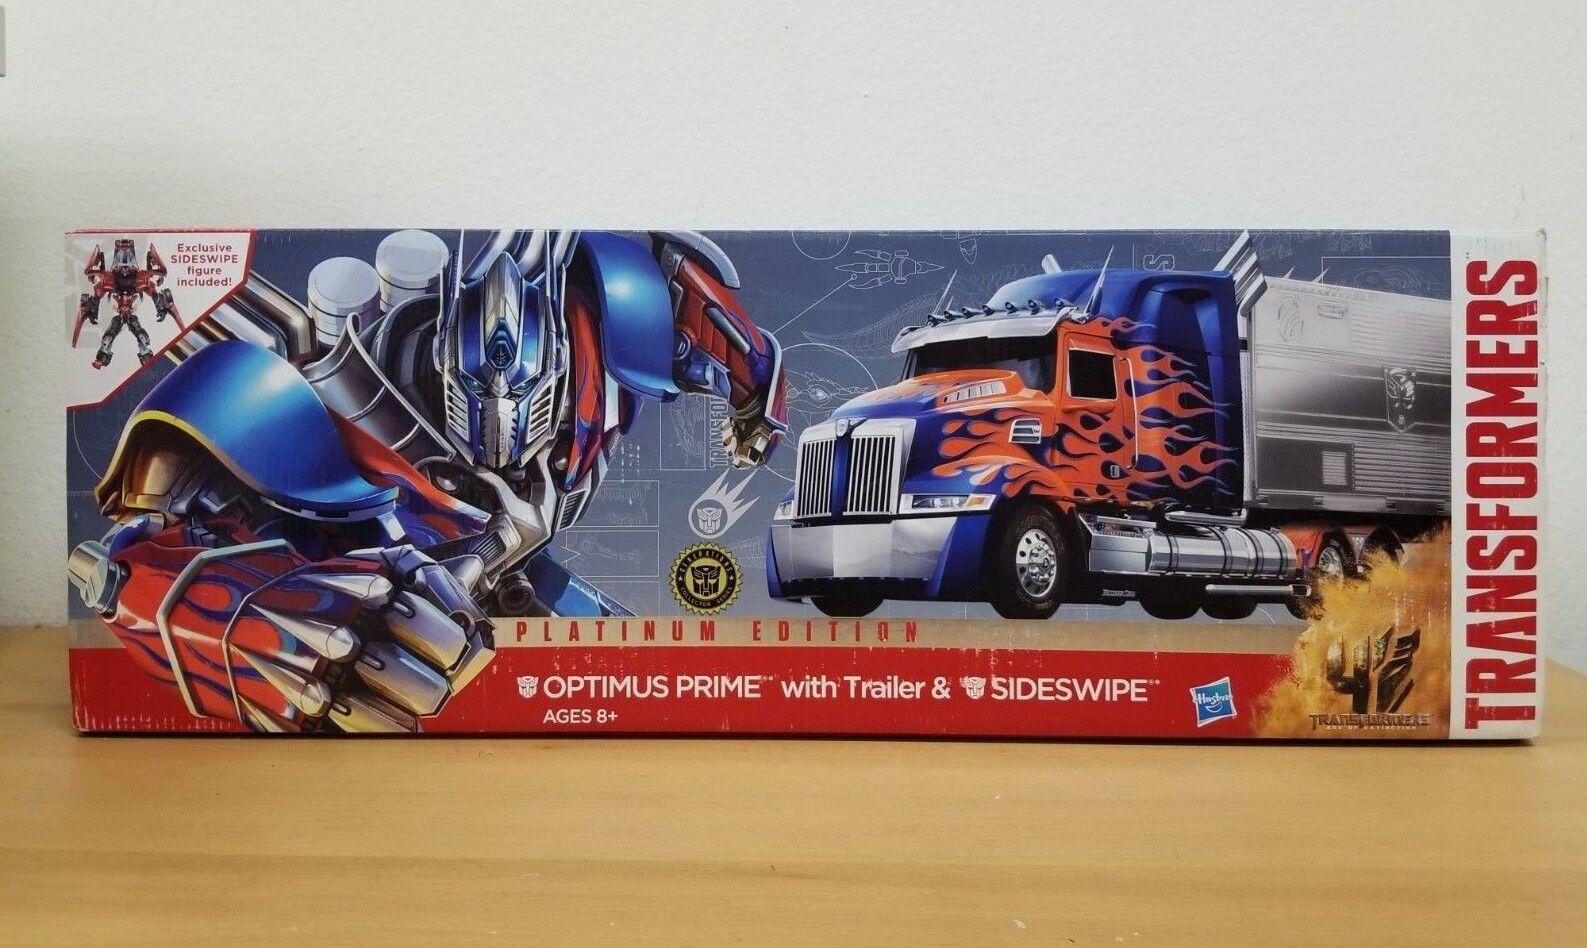 Transformers AGE of Extinction Platinum Edition Optimus Prime Trailer Sideswipe